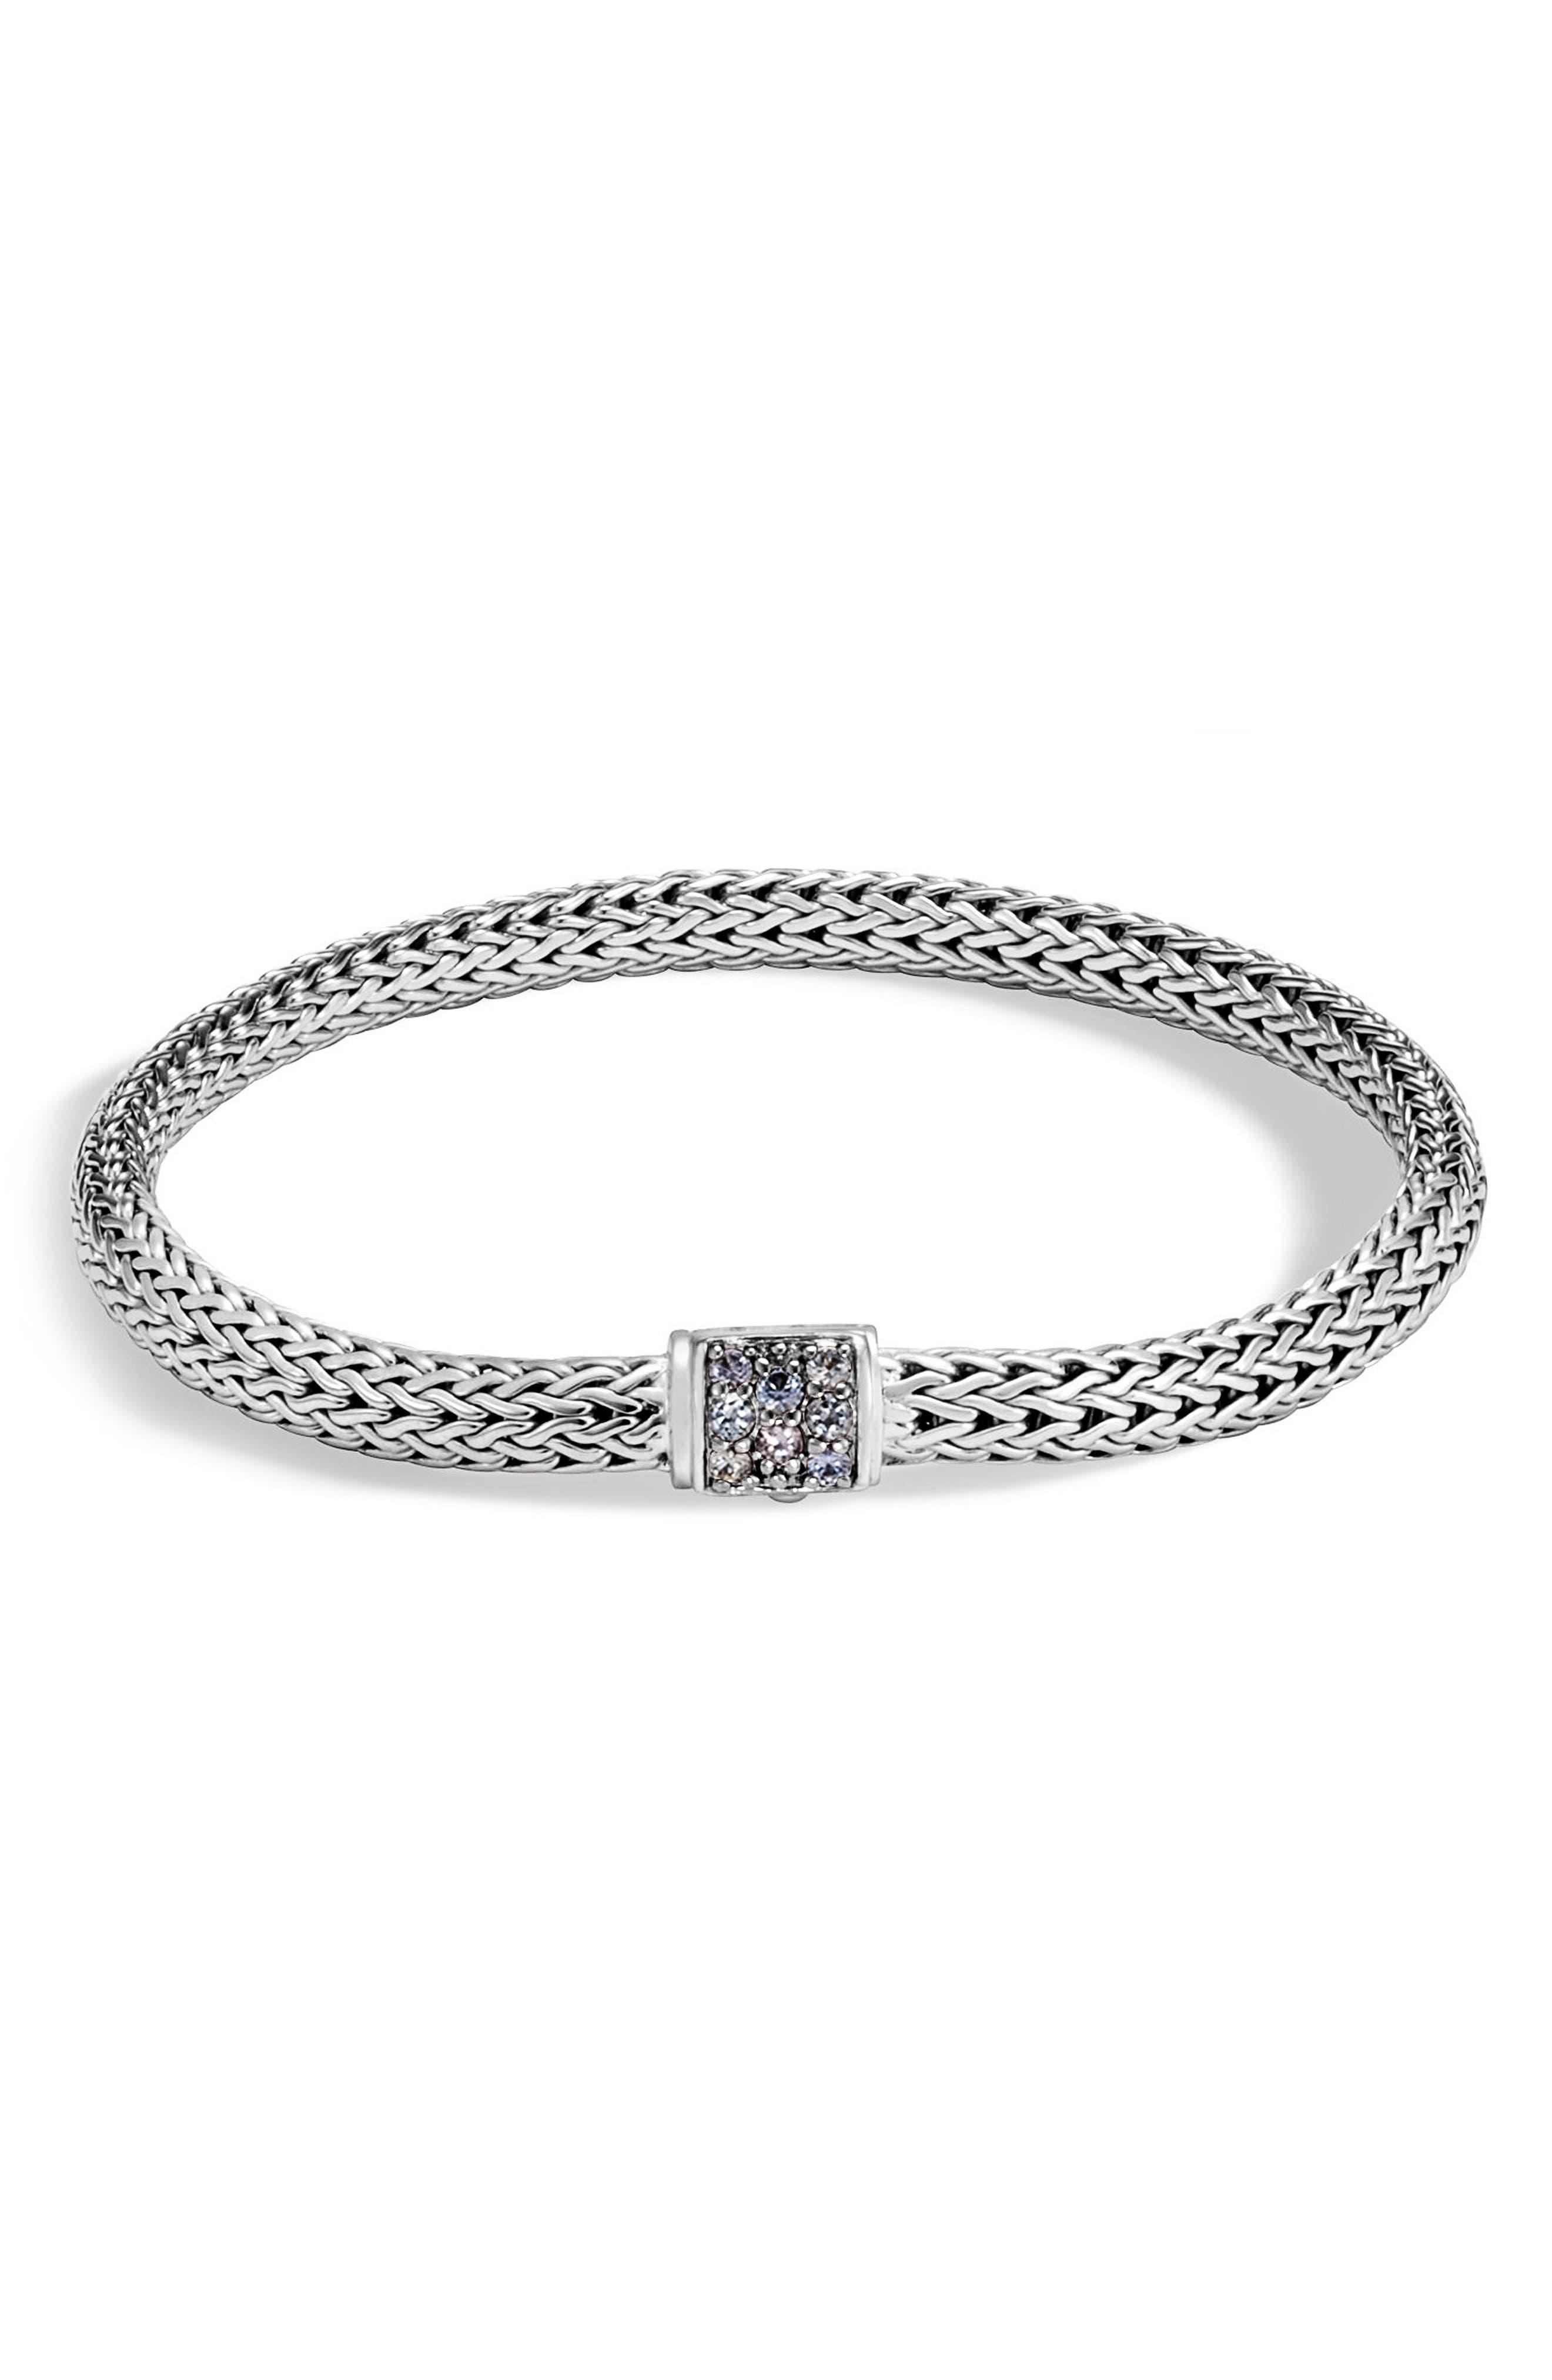 John Hardy Classic Chain 5mm Bracelet